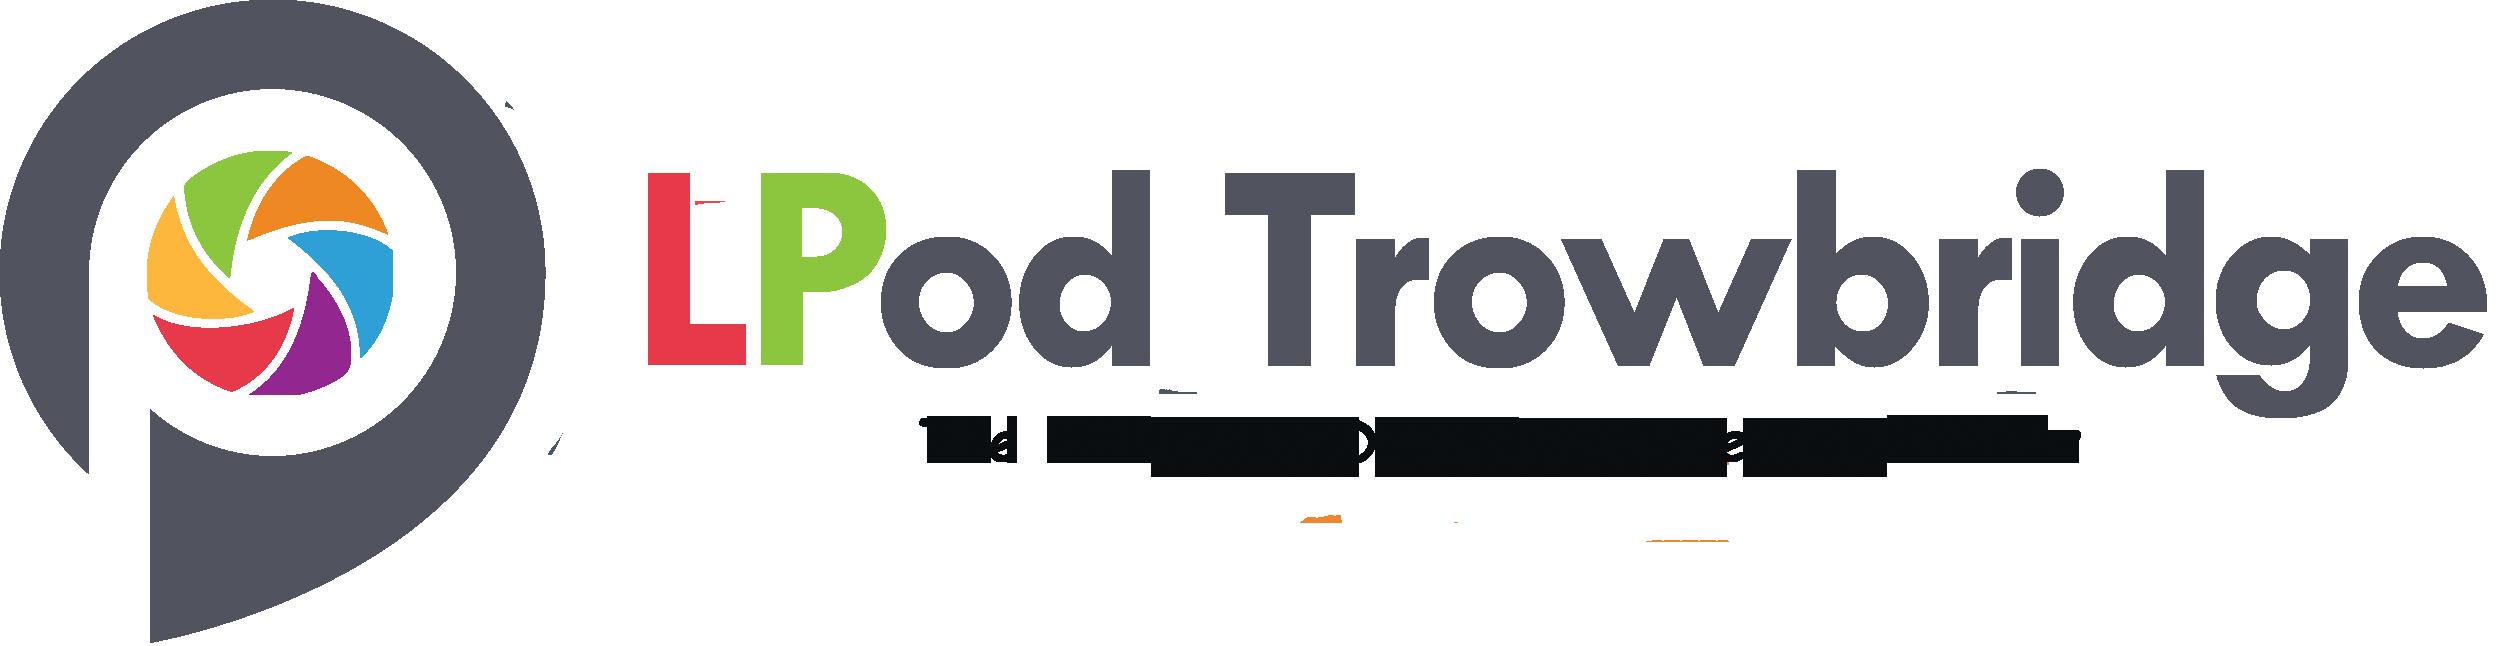 intensive driving courses trowbridge, intensive driving lessons trowbridge. intensive driving school trowbridge